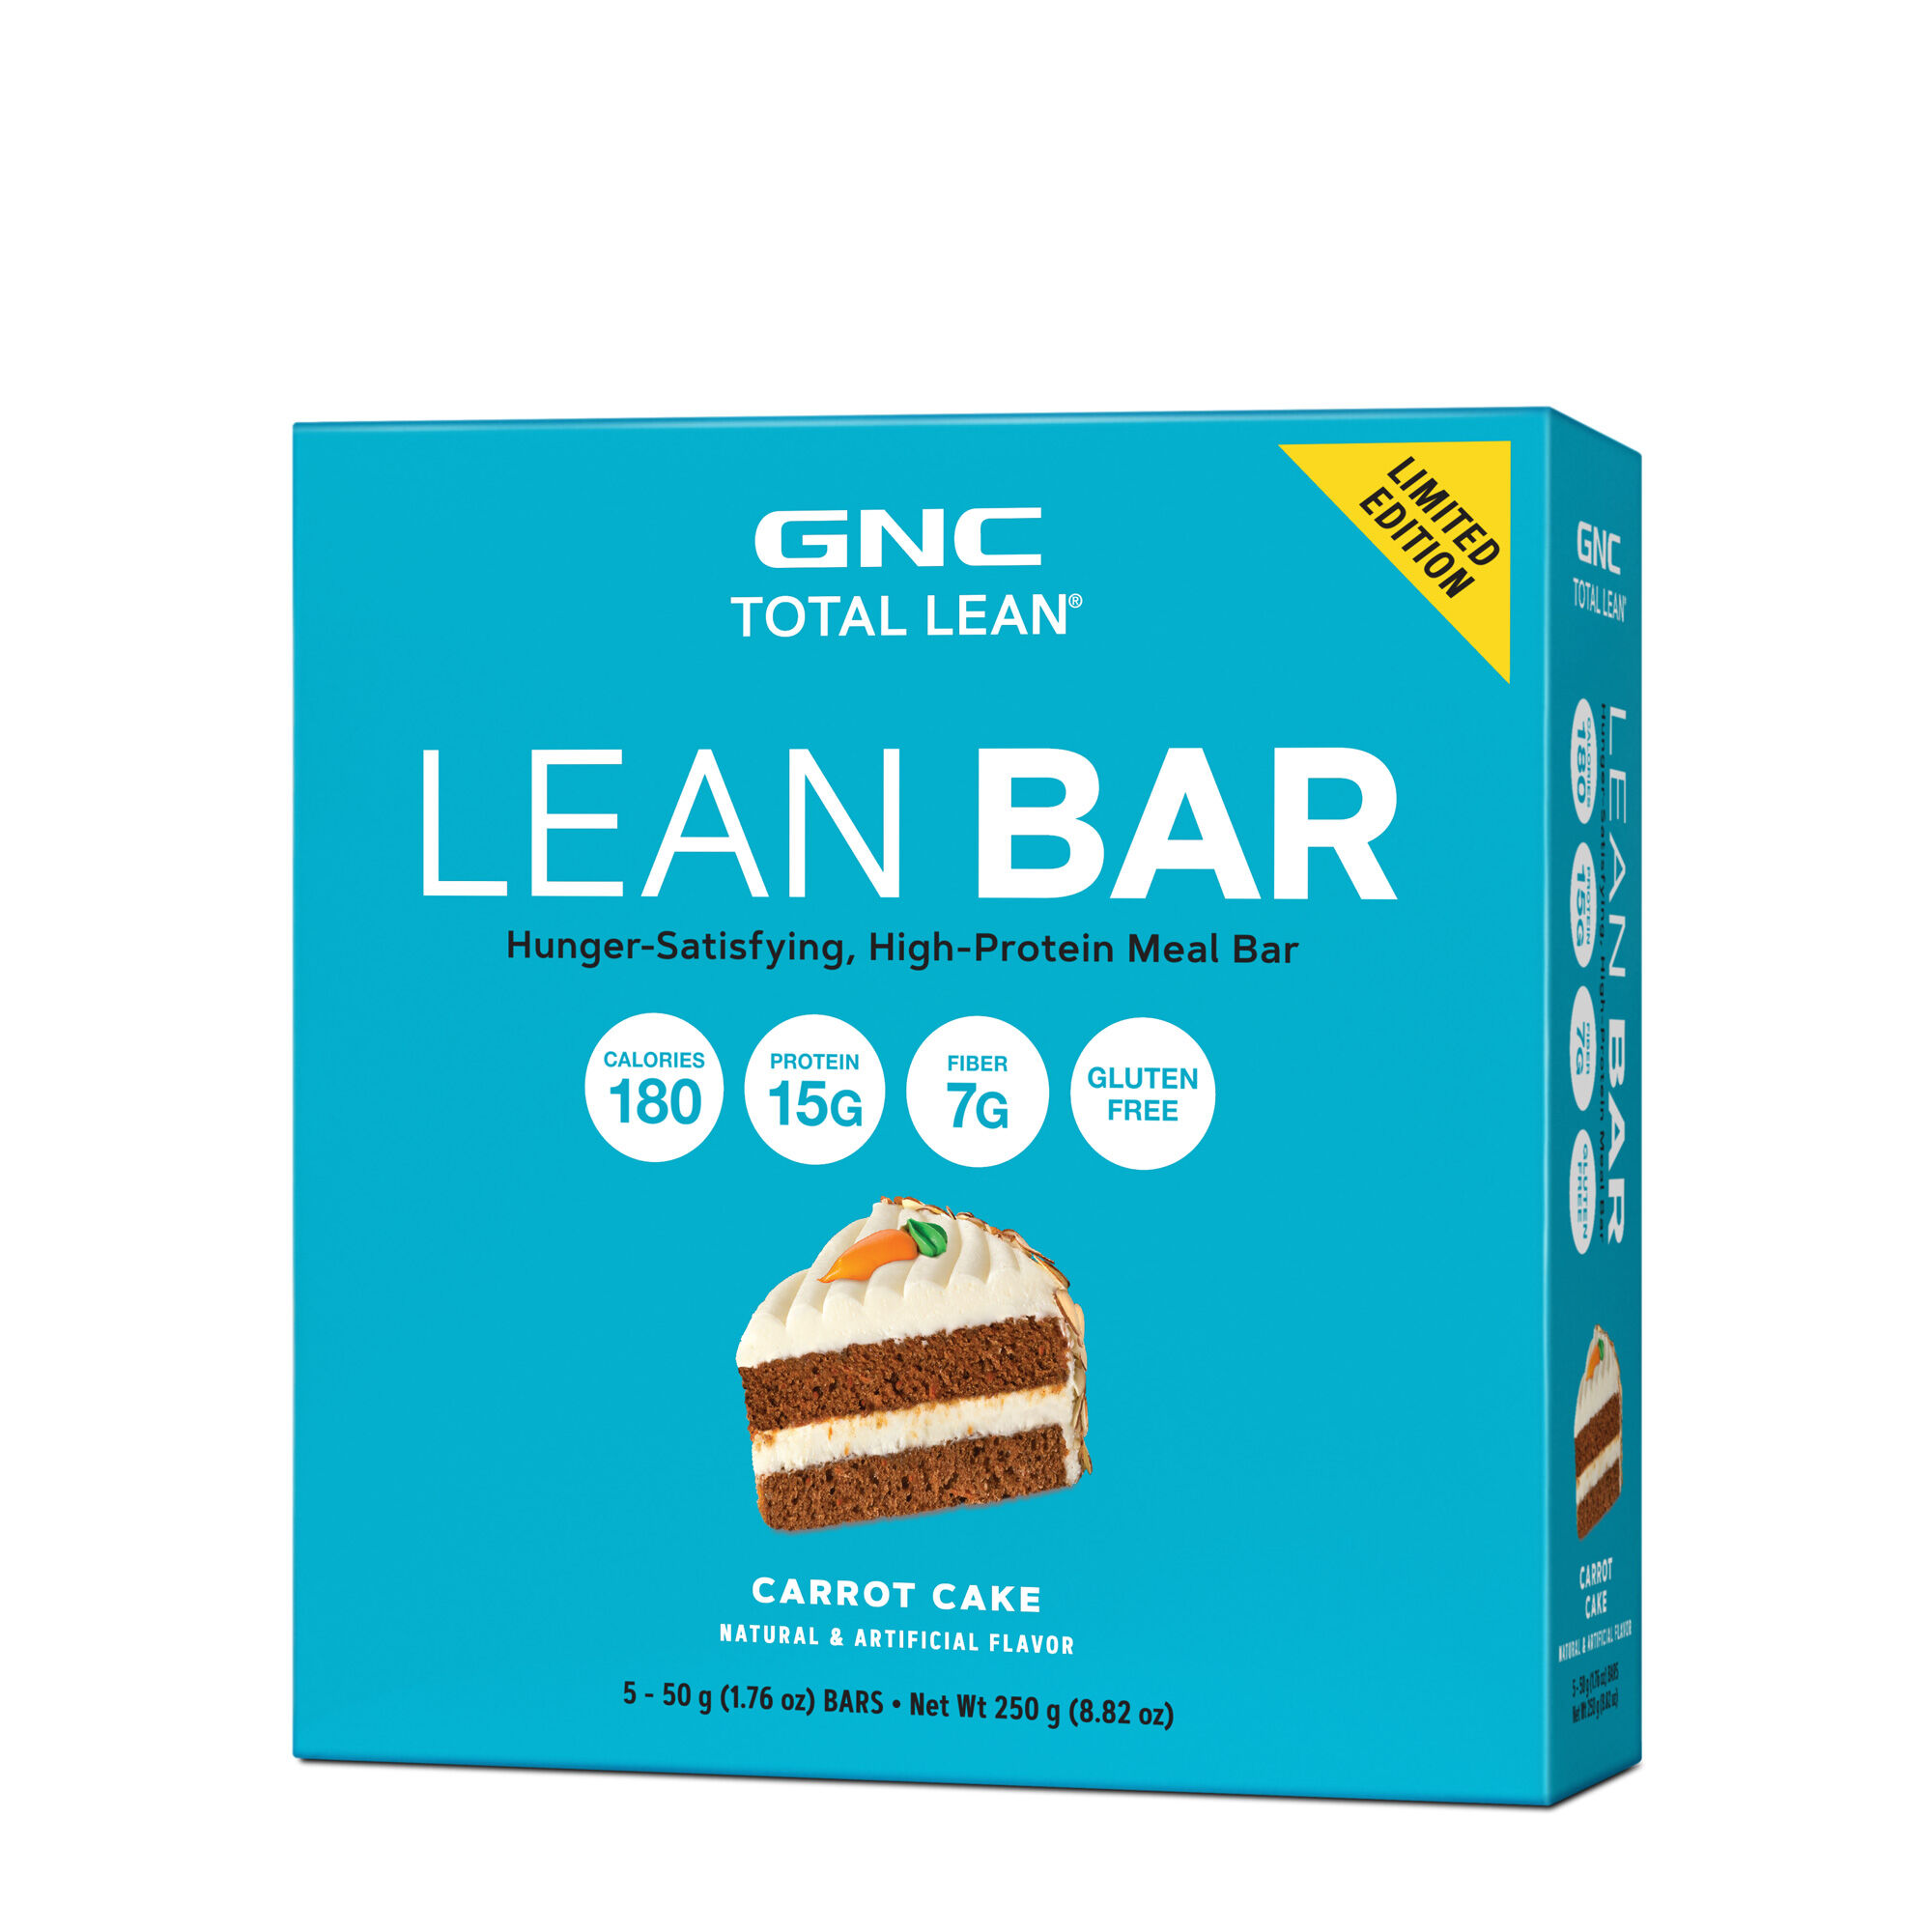 Lean Bar - Carrot Cake